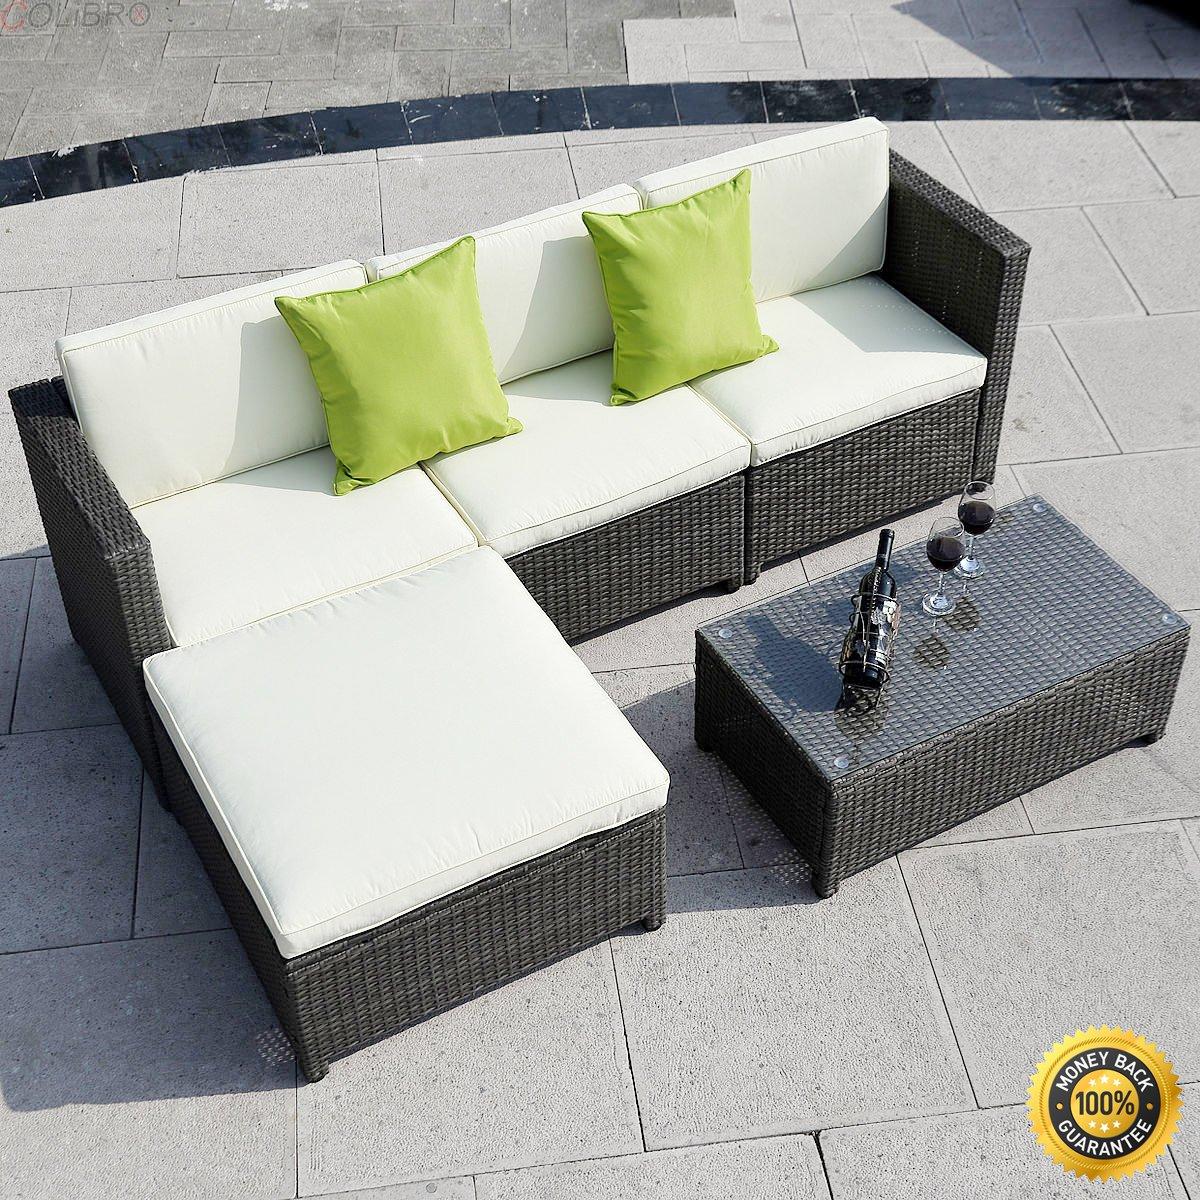 Amazon.com : COLIBROX-- 5PC Outdoor Patio Sofa Set Furniture PE ...